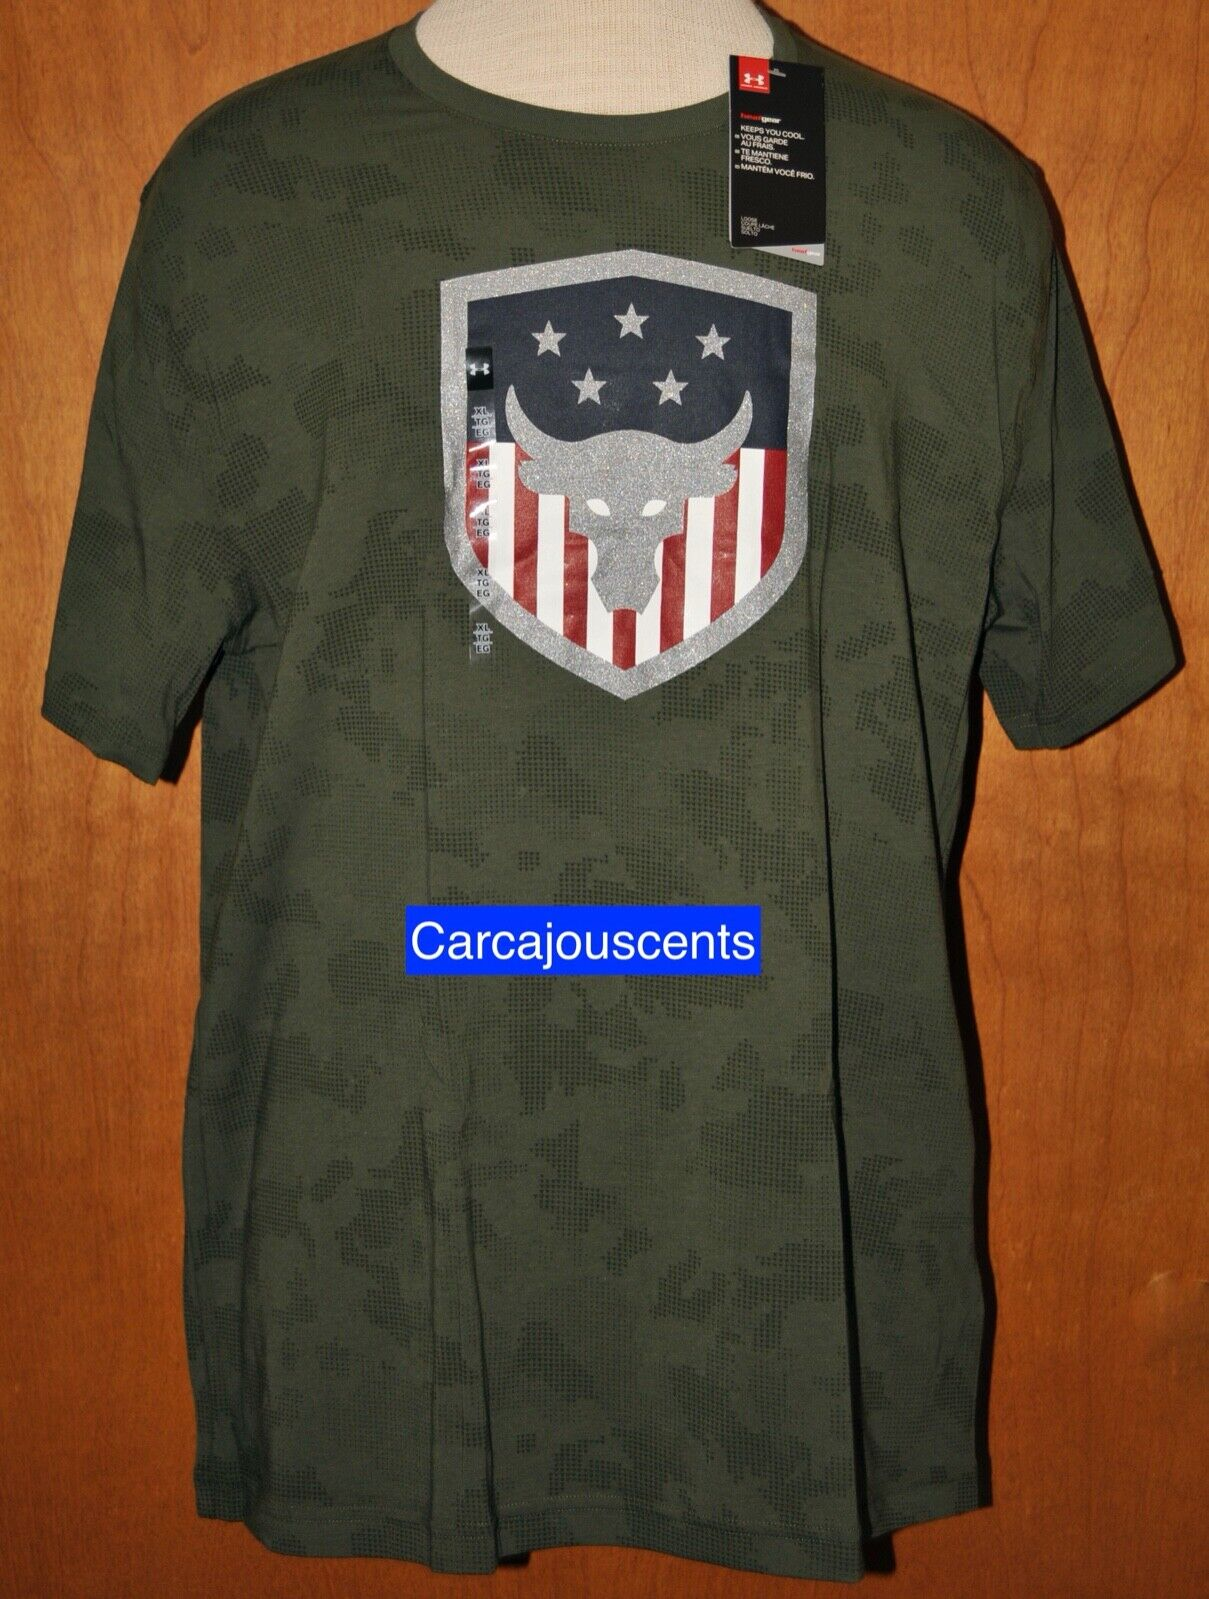 D.R.I DEALING WITH IT Mens Black Rock T-shirt NEW Sizes S-XXXL